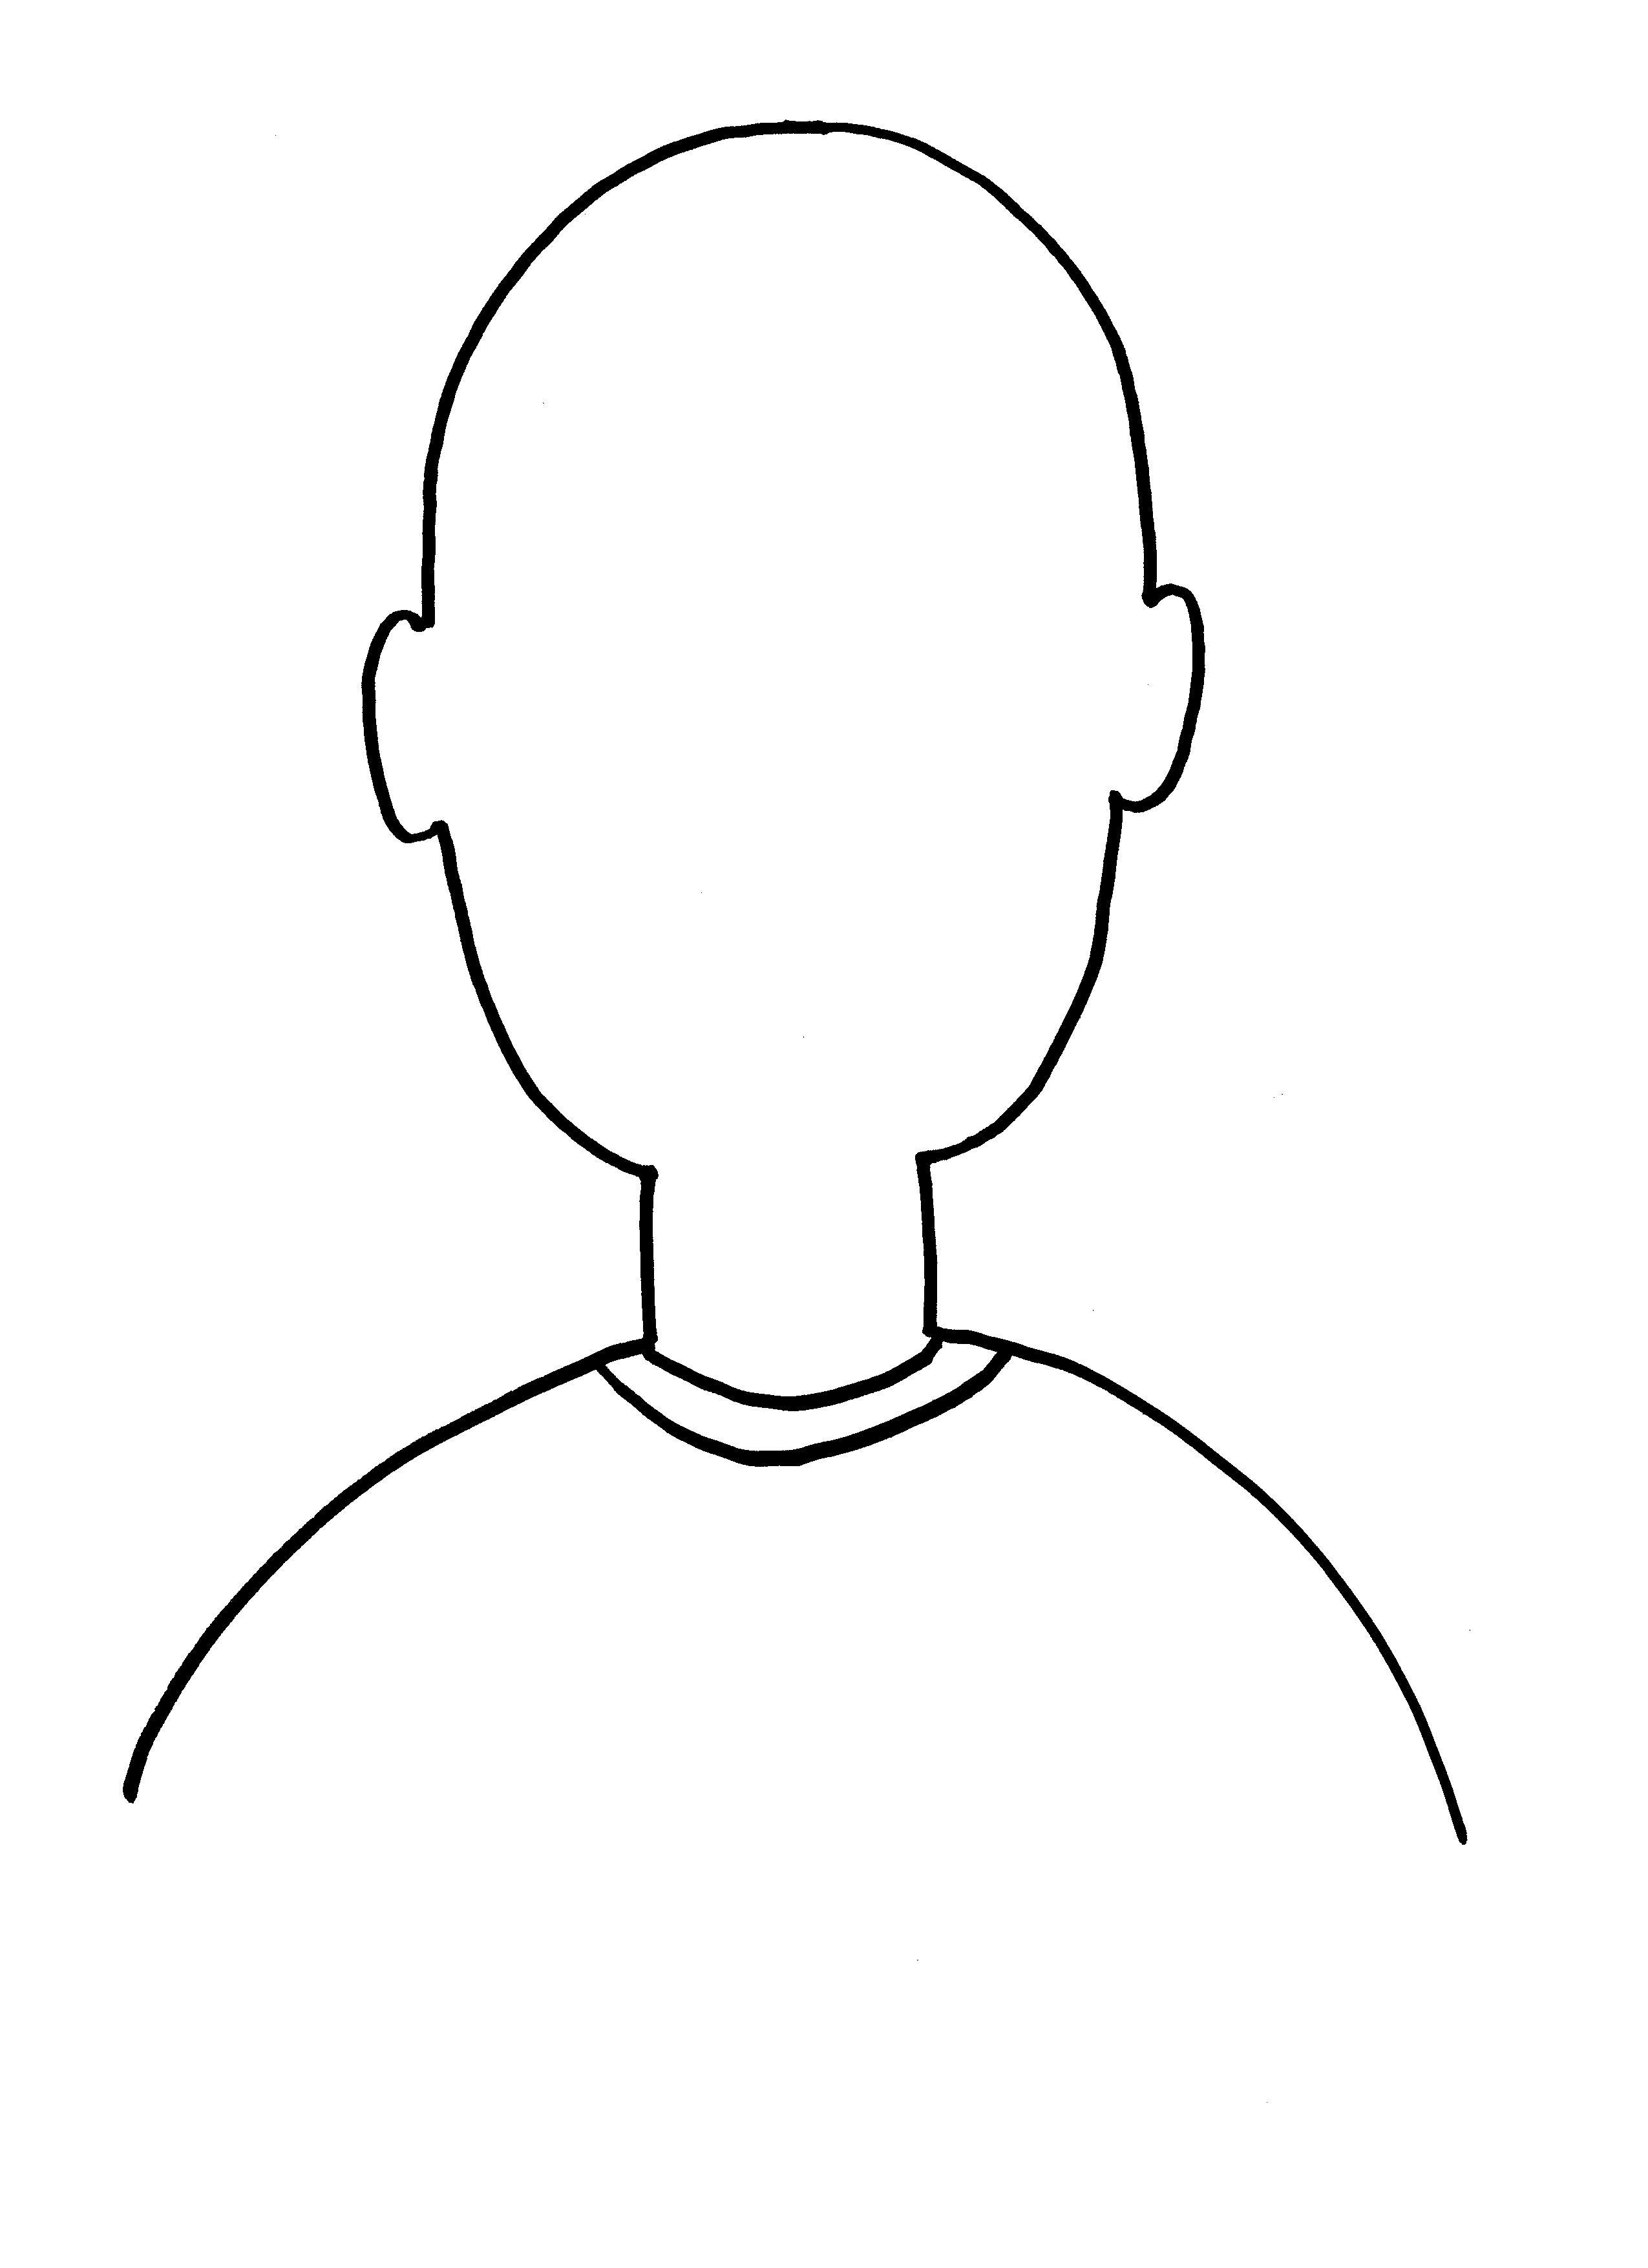 Self Portrait Template Preschool Printable